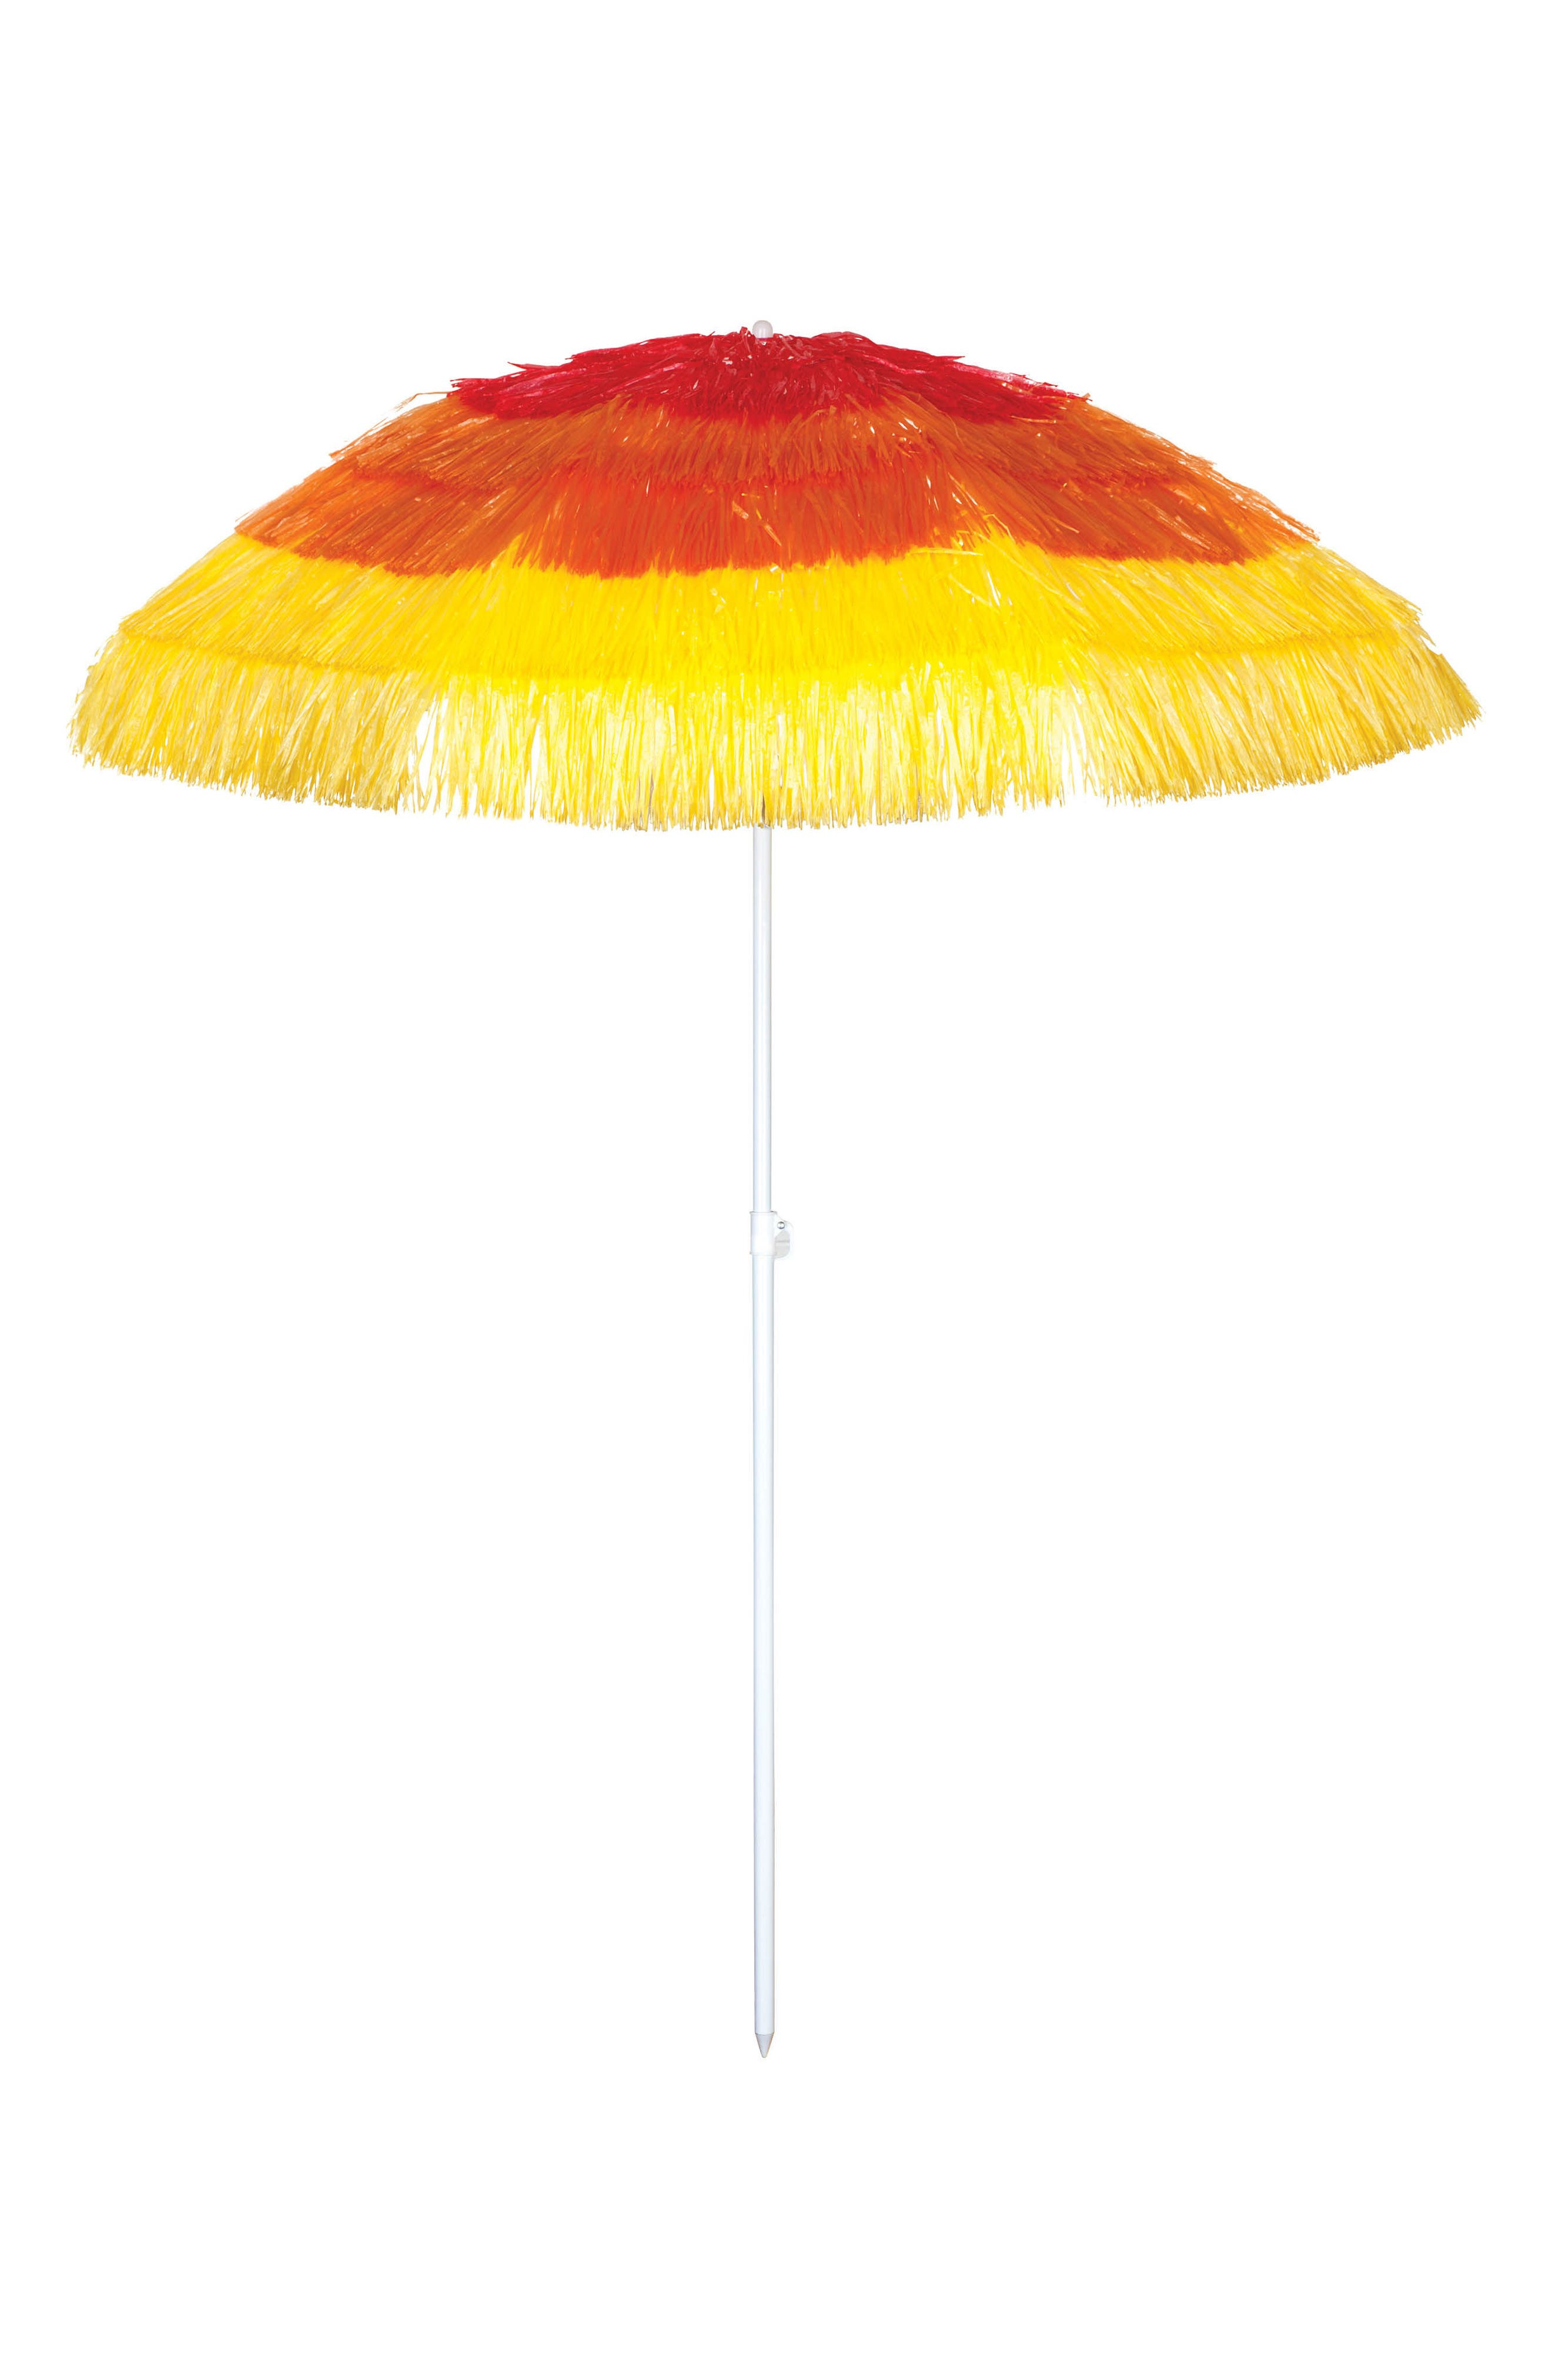 Sunnylife Sundowners Carnival Umbrella